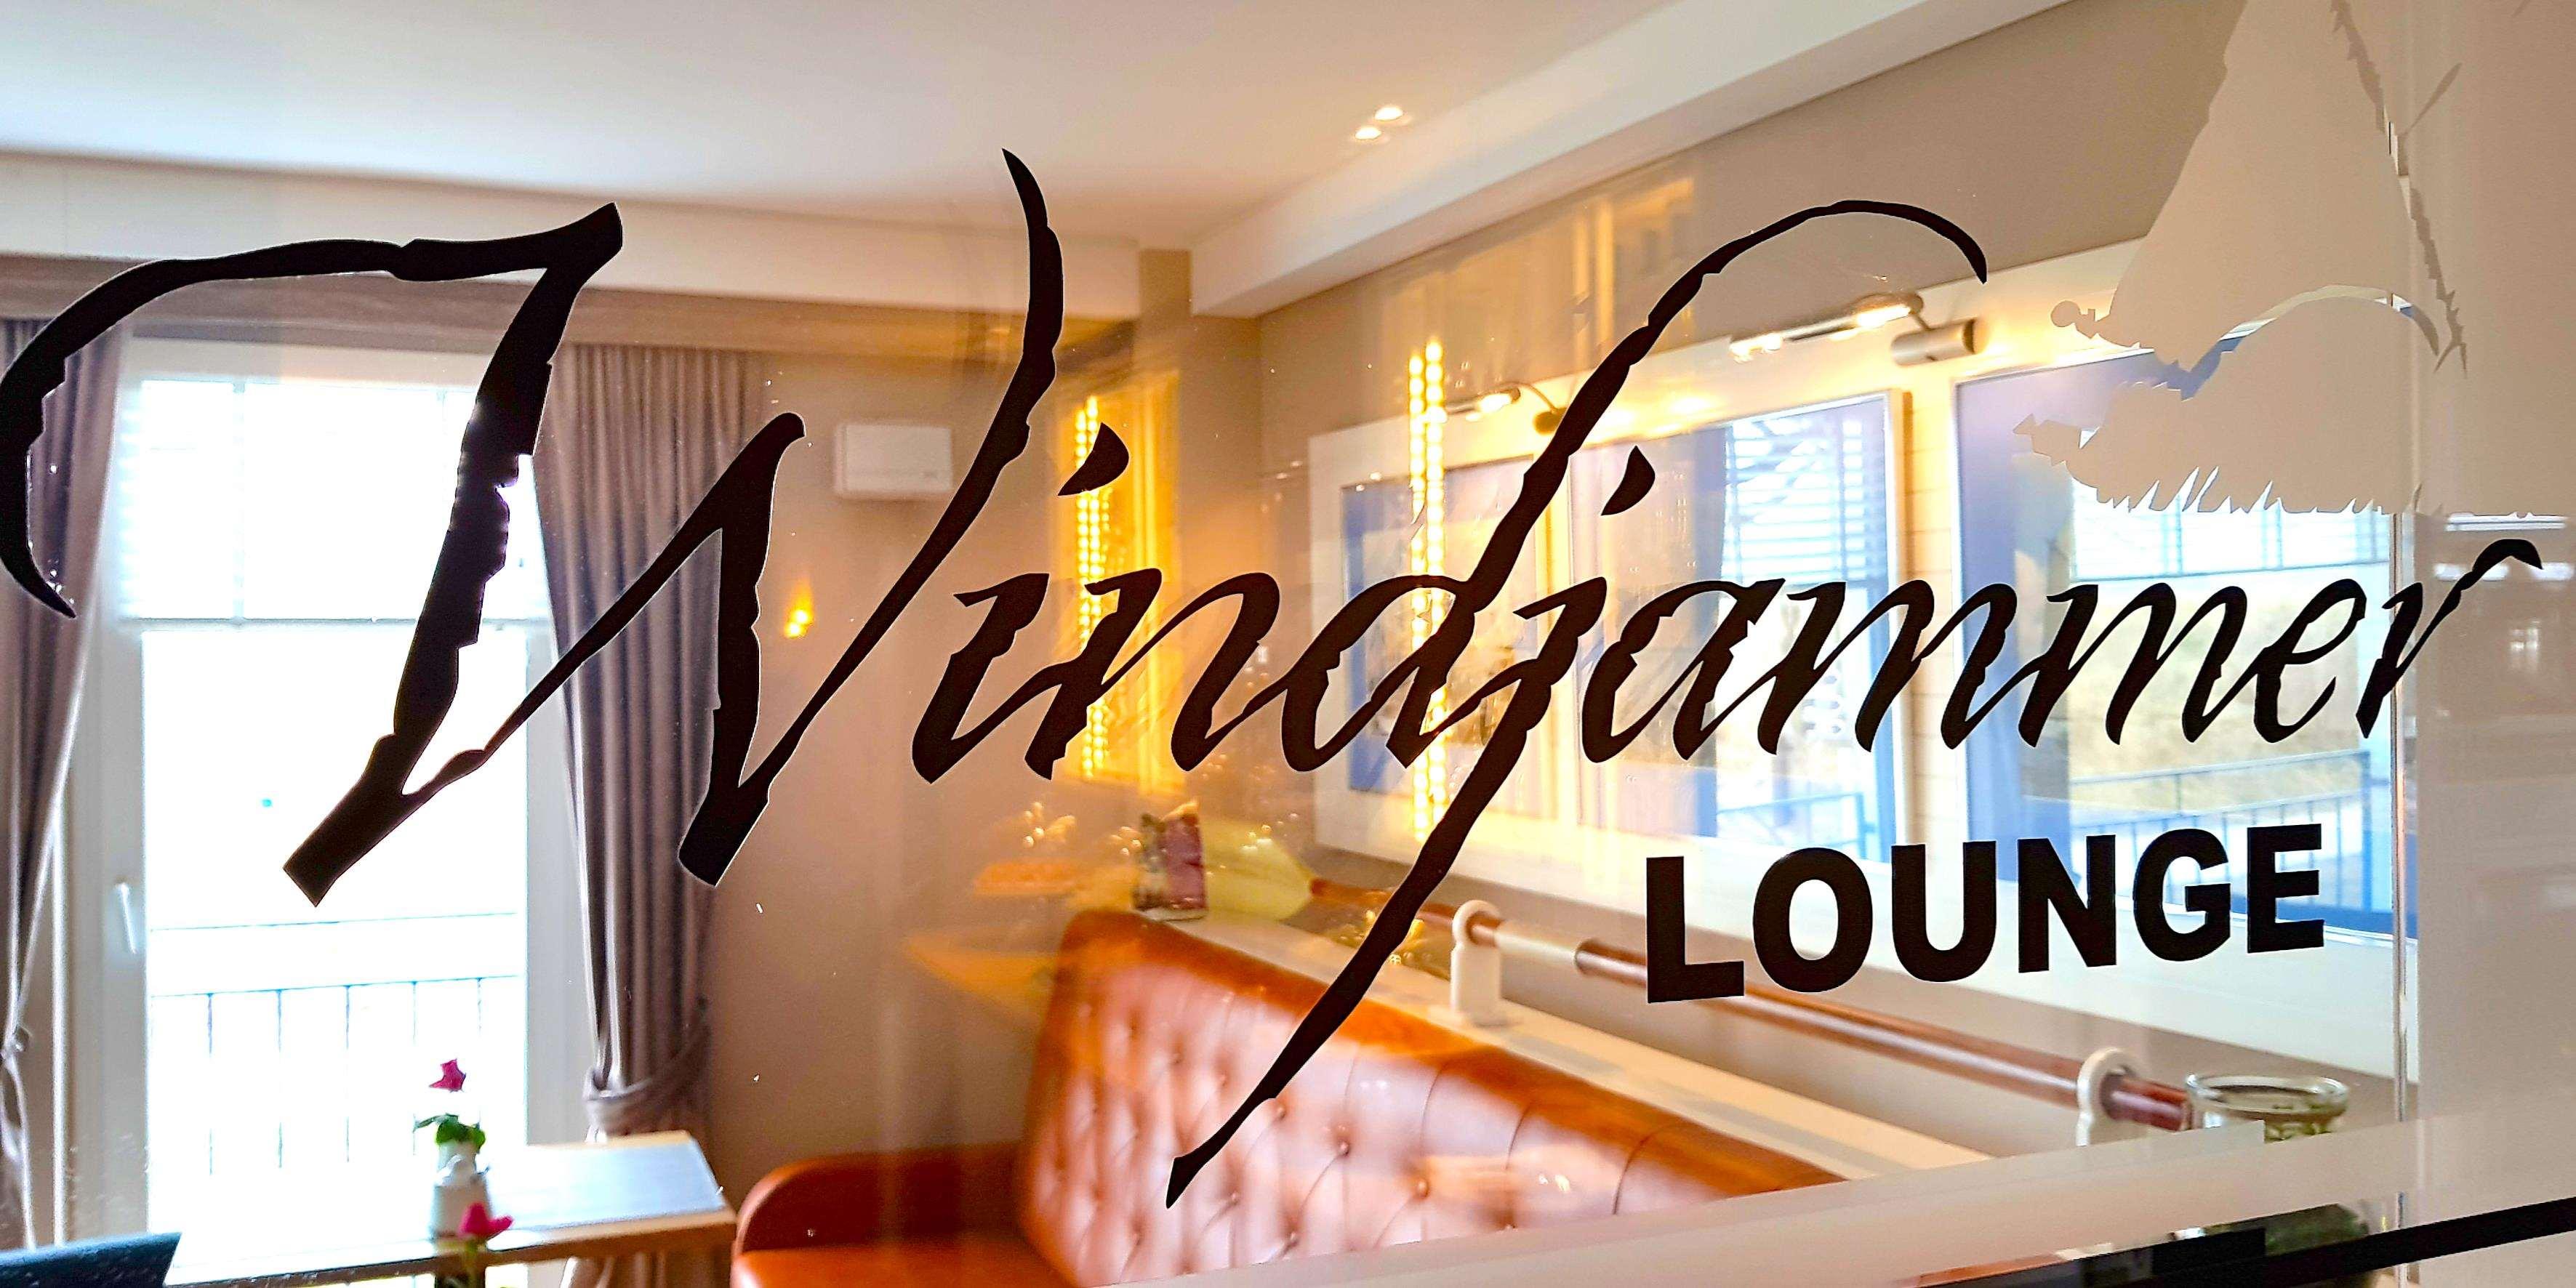 Windjammer Lounge